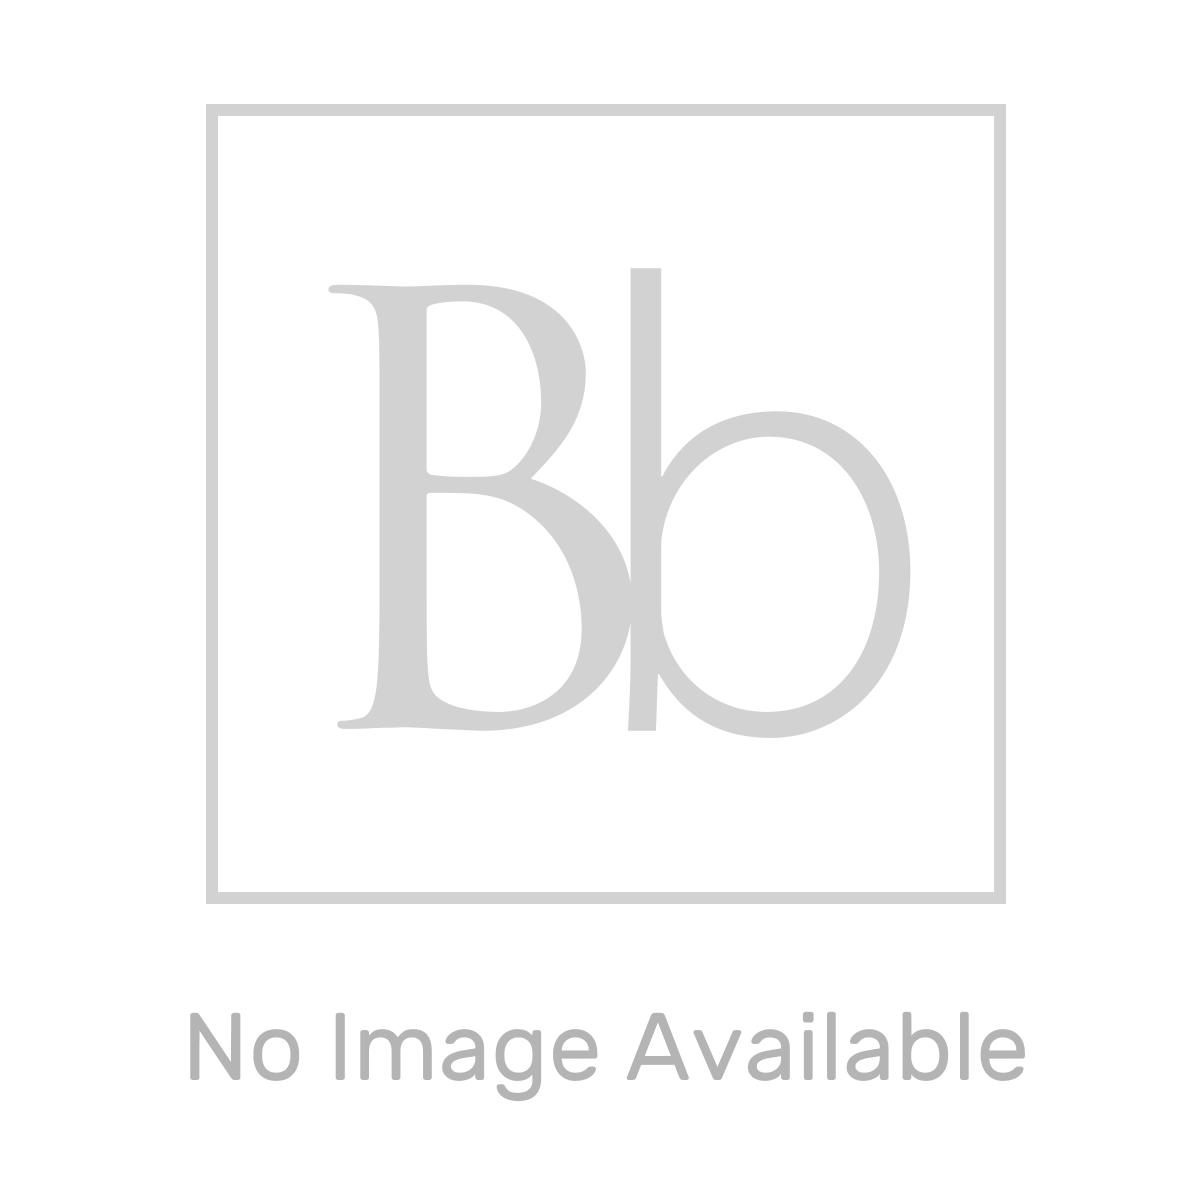 RAK Series 600 Standard Wrap Over Toilet Seat Dimensions